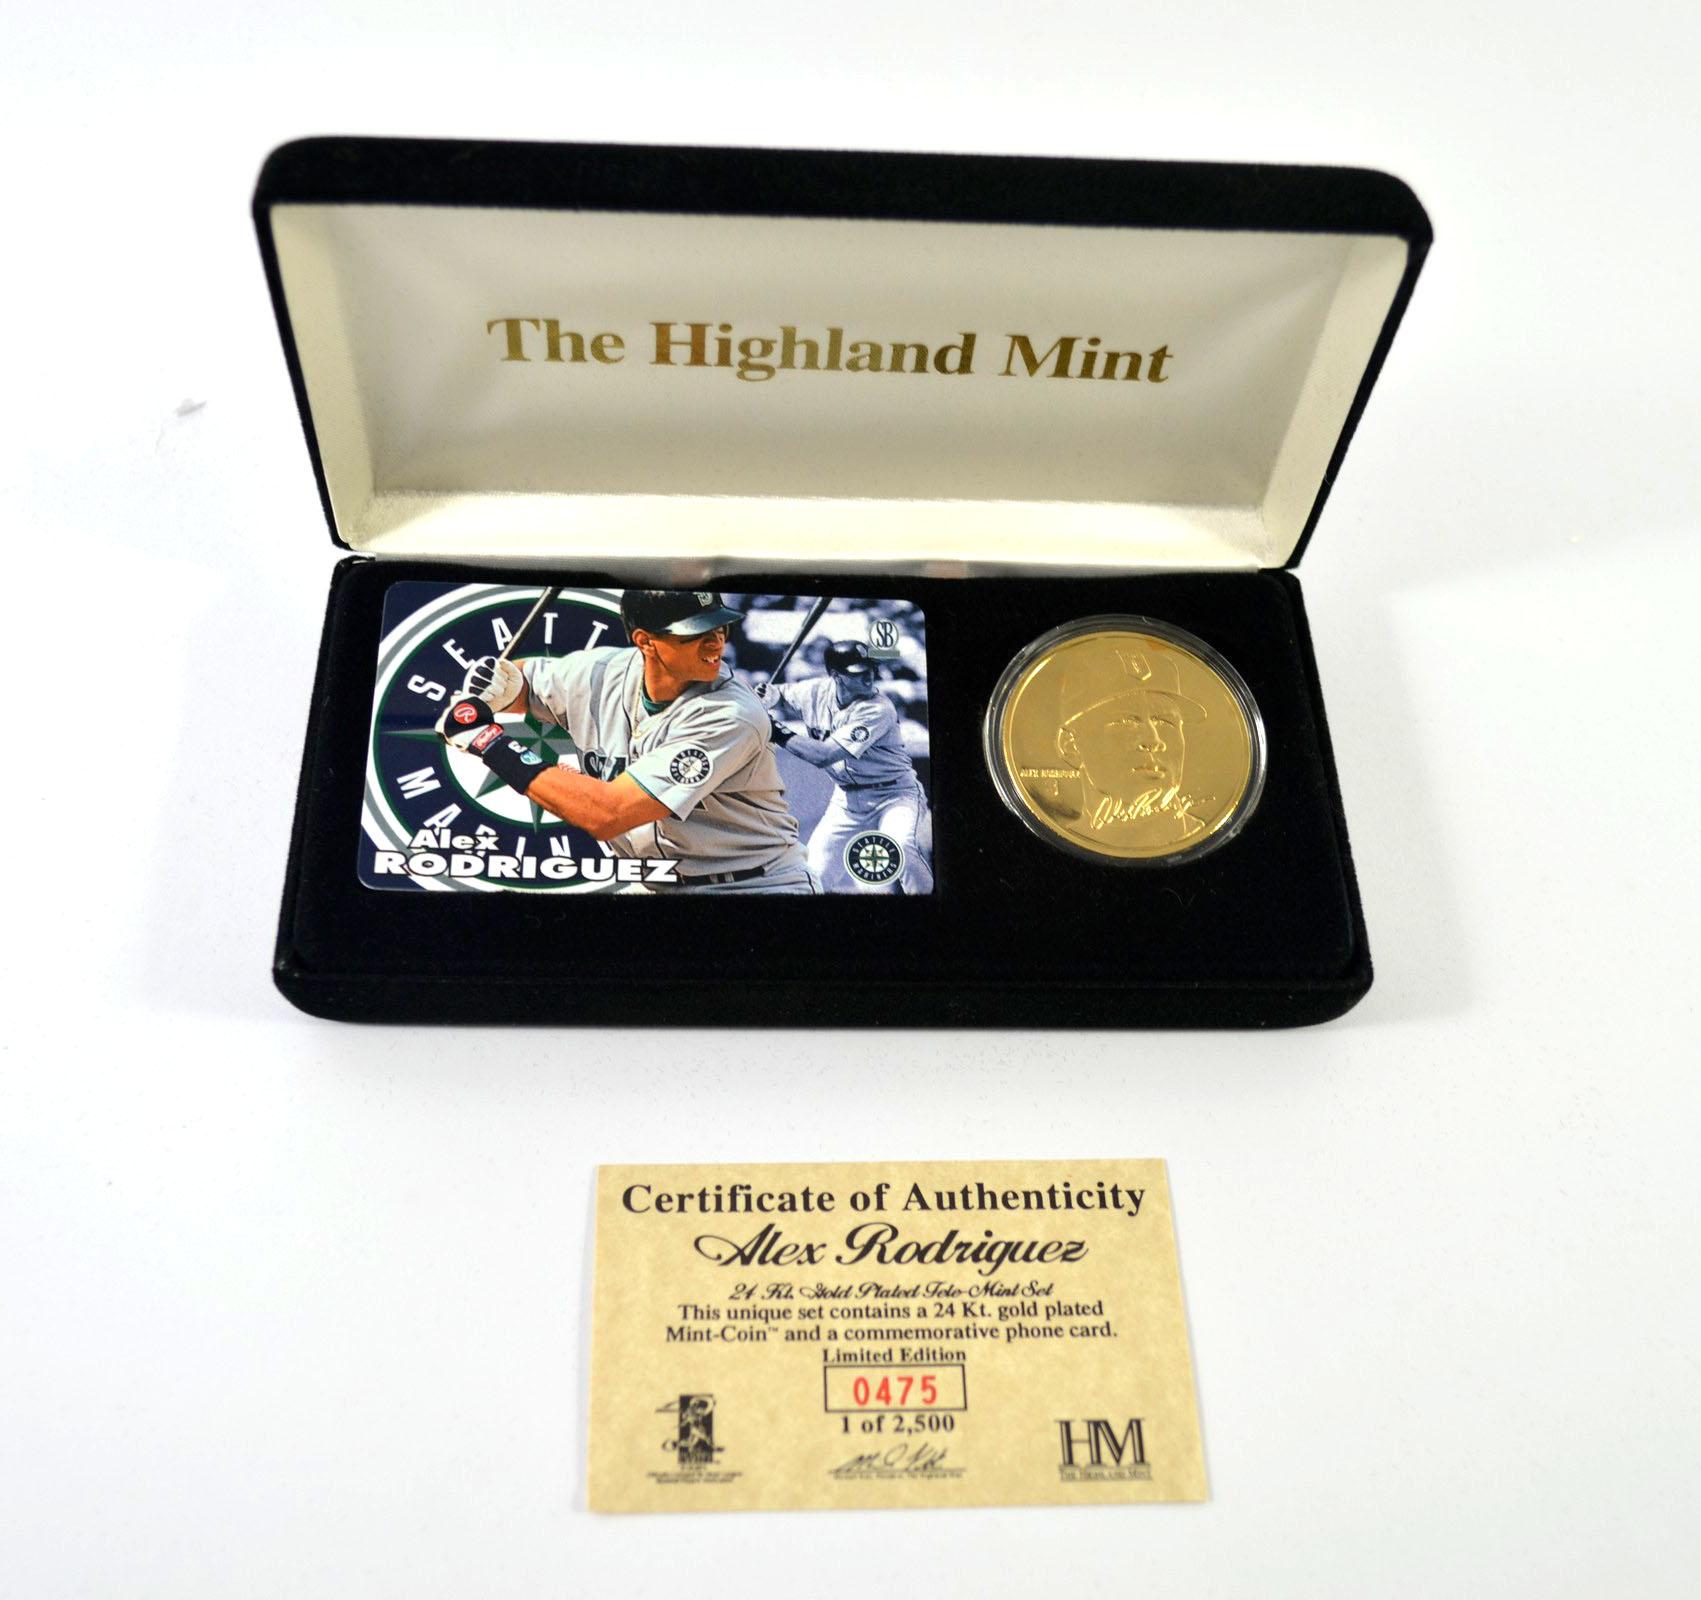 Highland Mint Alex Rodriguez Tele-Mint Set Gold Coin & Phone Card ...